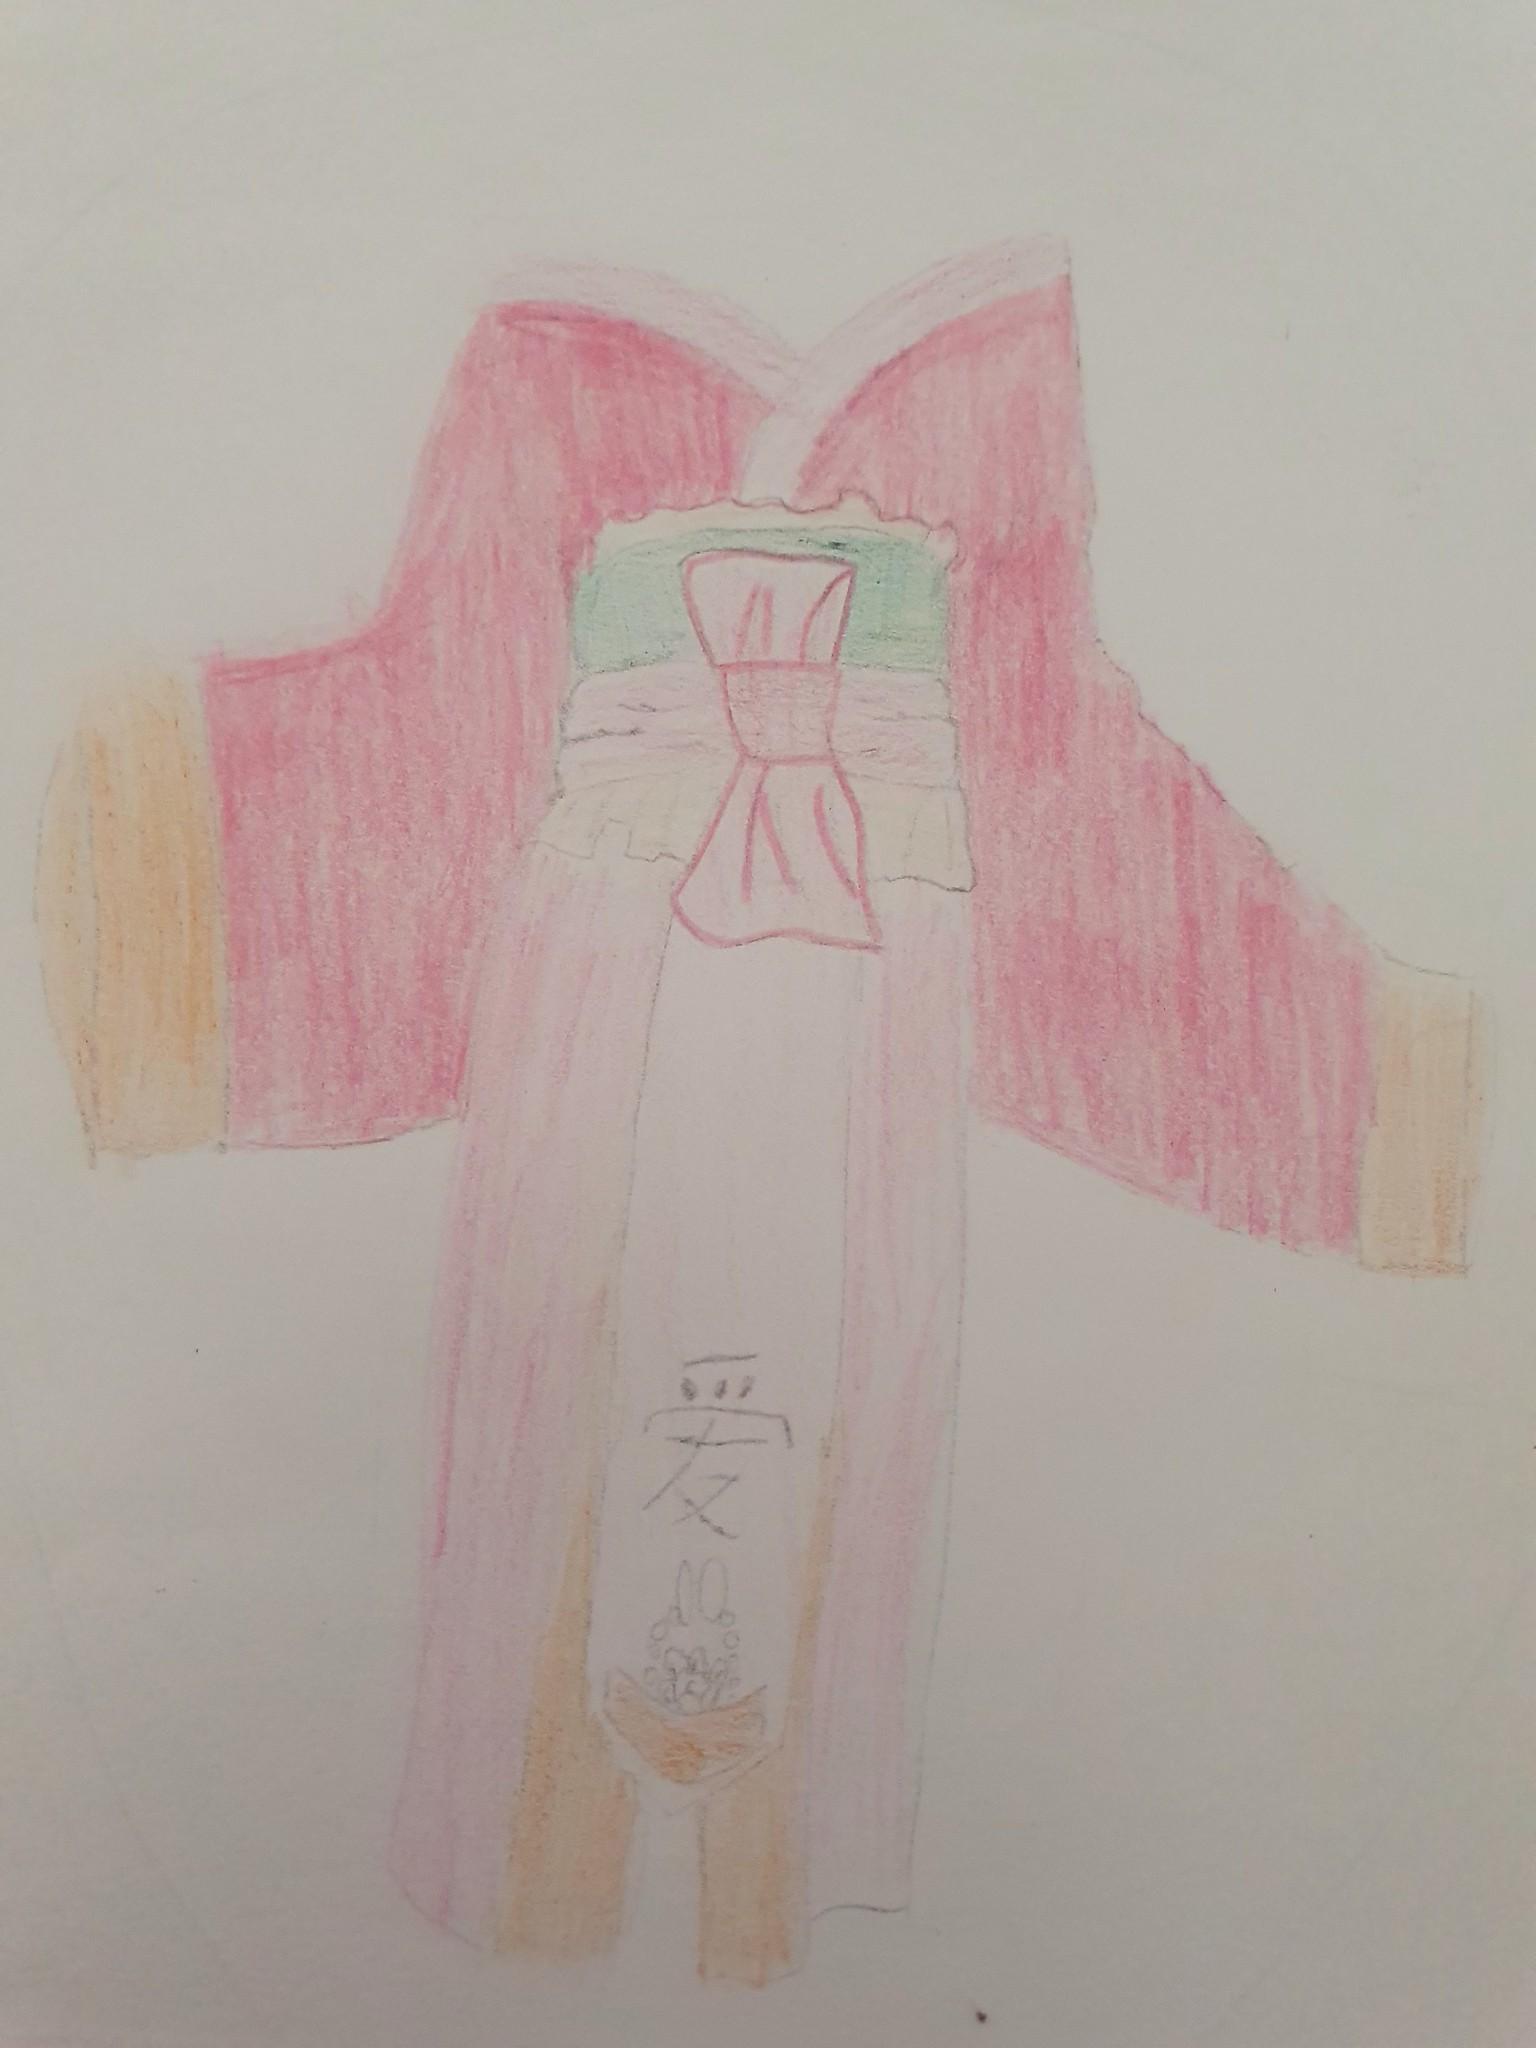 Sarah-Lucie S., 9 Jahre, aus PARIS